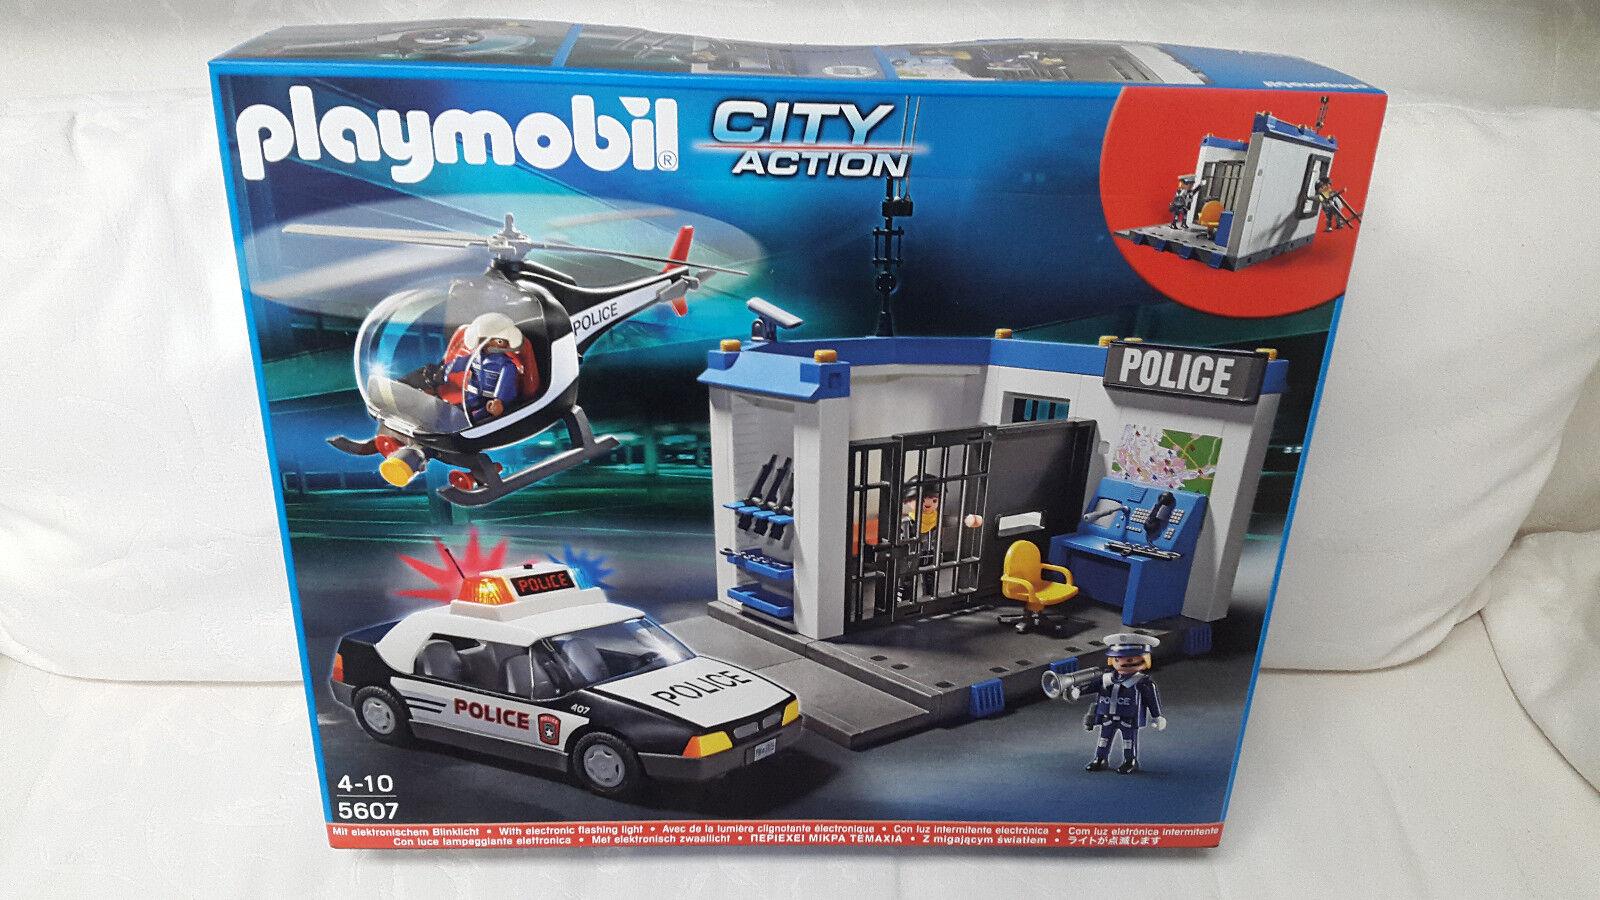 PLAYMOBIL 5607 City City City Action Set polizia elicottero polizia luce auto NUOVO & OVP 9afe38